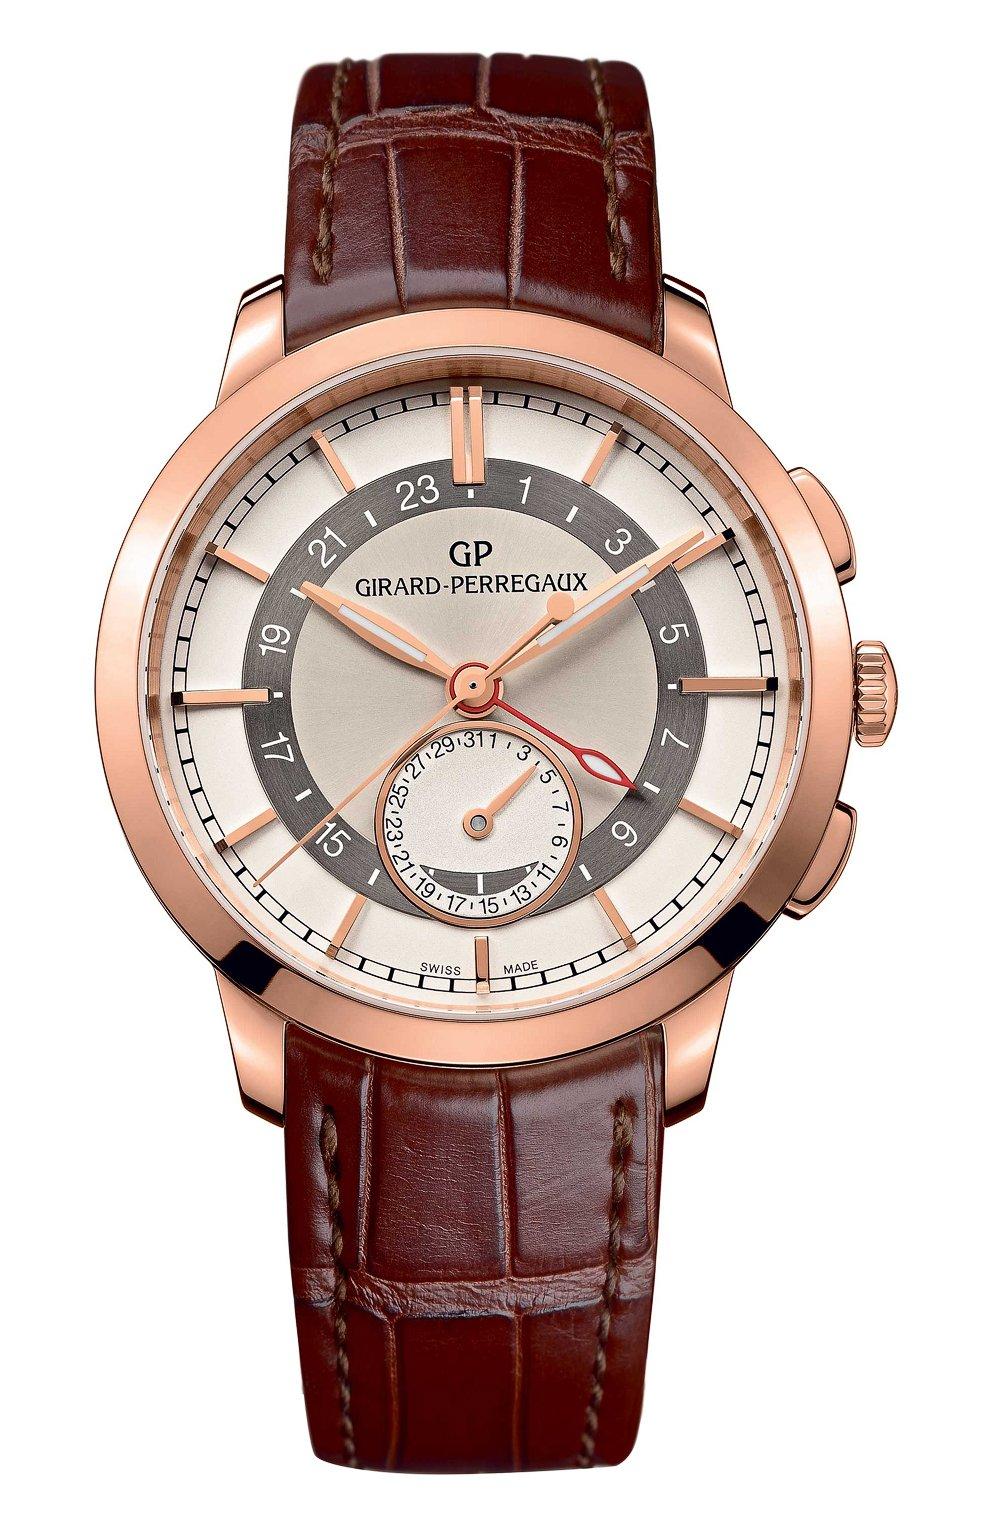 Мужские часы dual time rose gold cream GIRARD-PERREGAUX серебряного цвета, арт. 49544-52-131-BBB0 | Фото 1